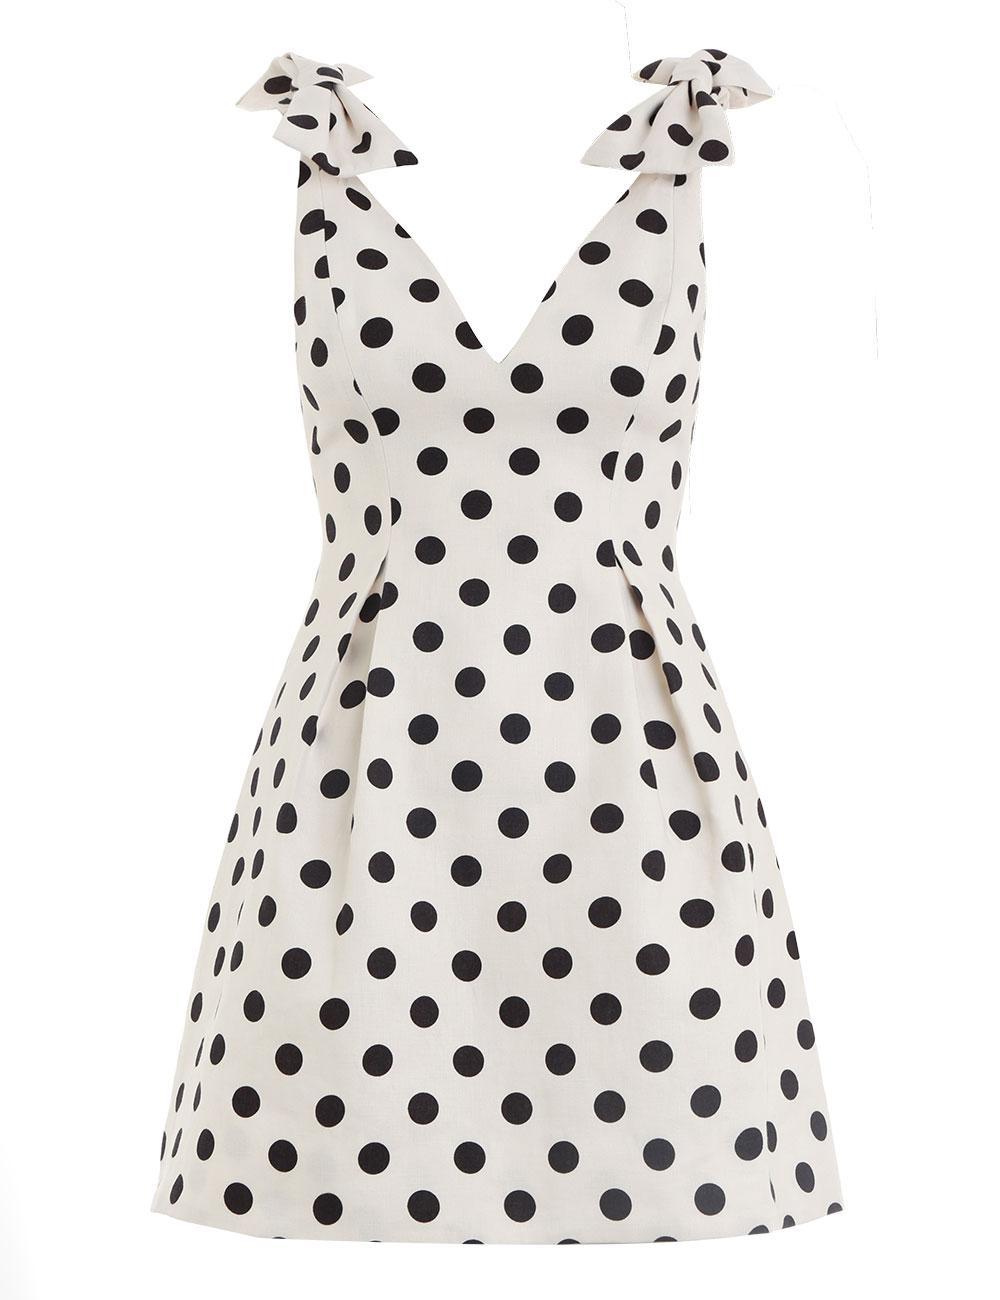 943513243d Lyst - Zimmermann Polka Dot Mini Dress in White - Save 1%